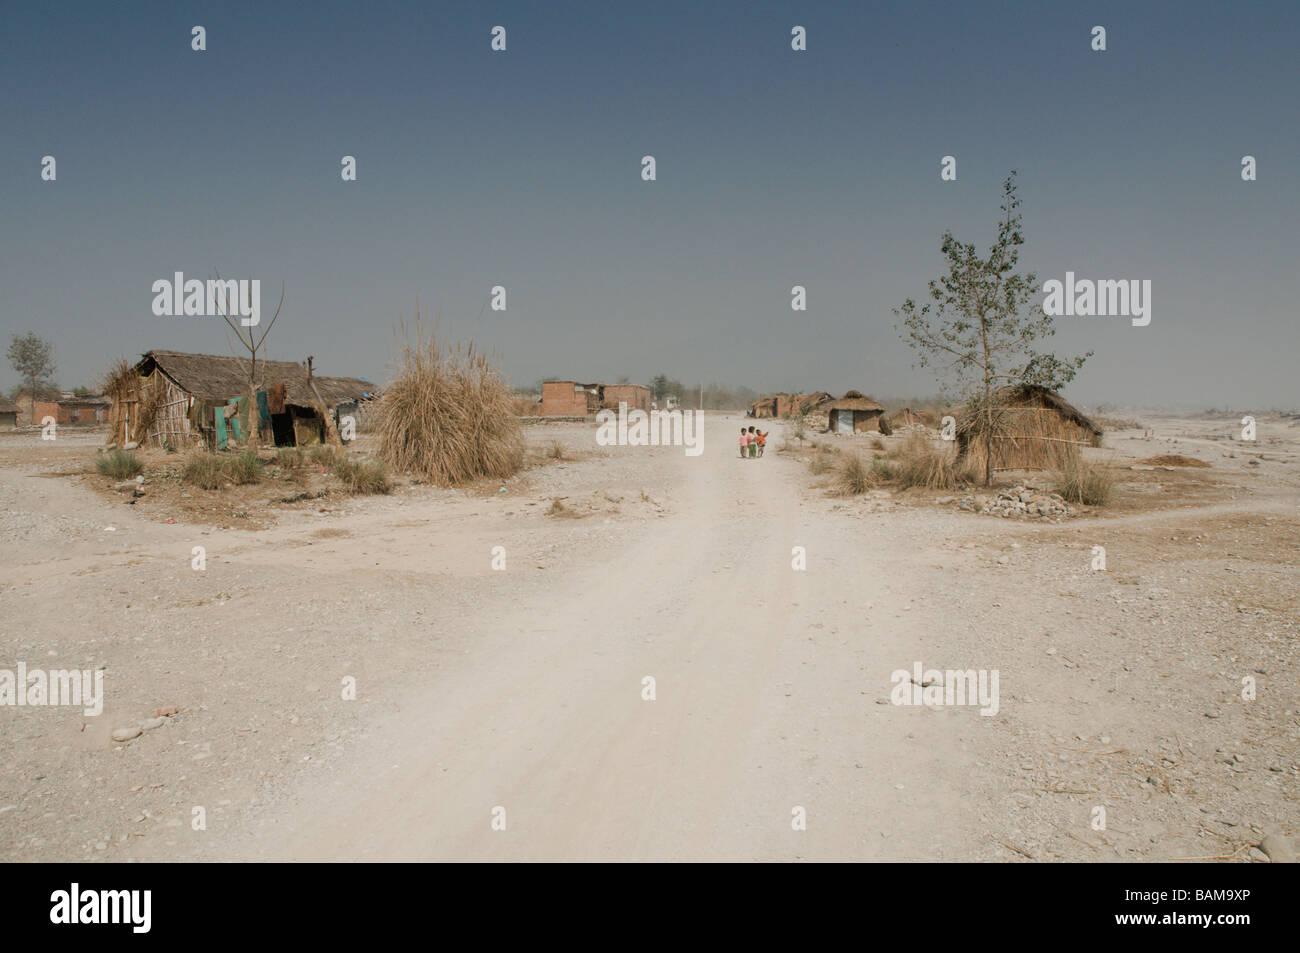 slum/village life - Stock Image